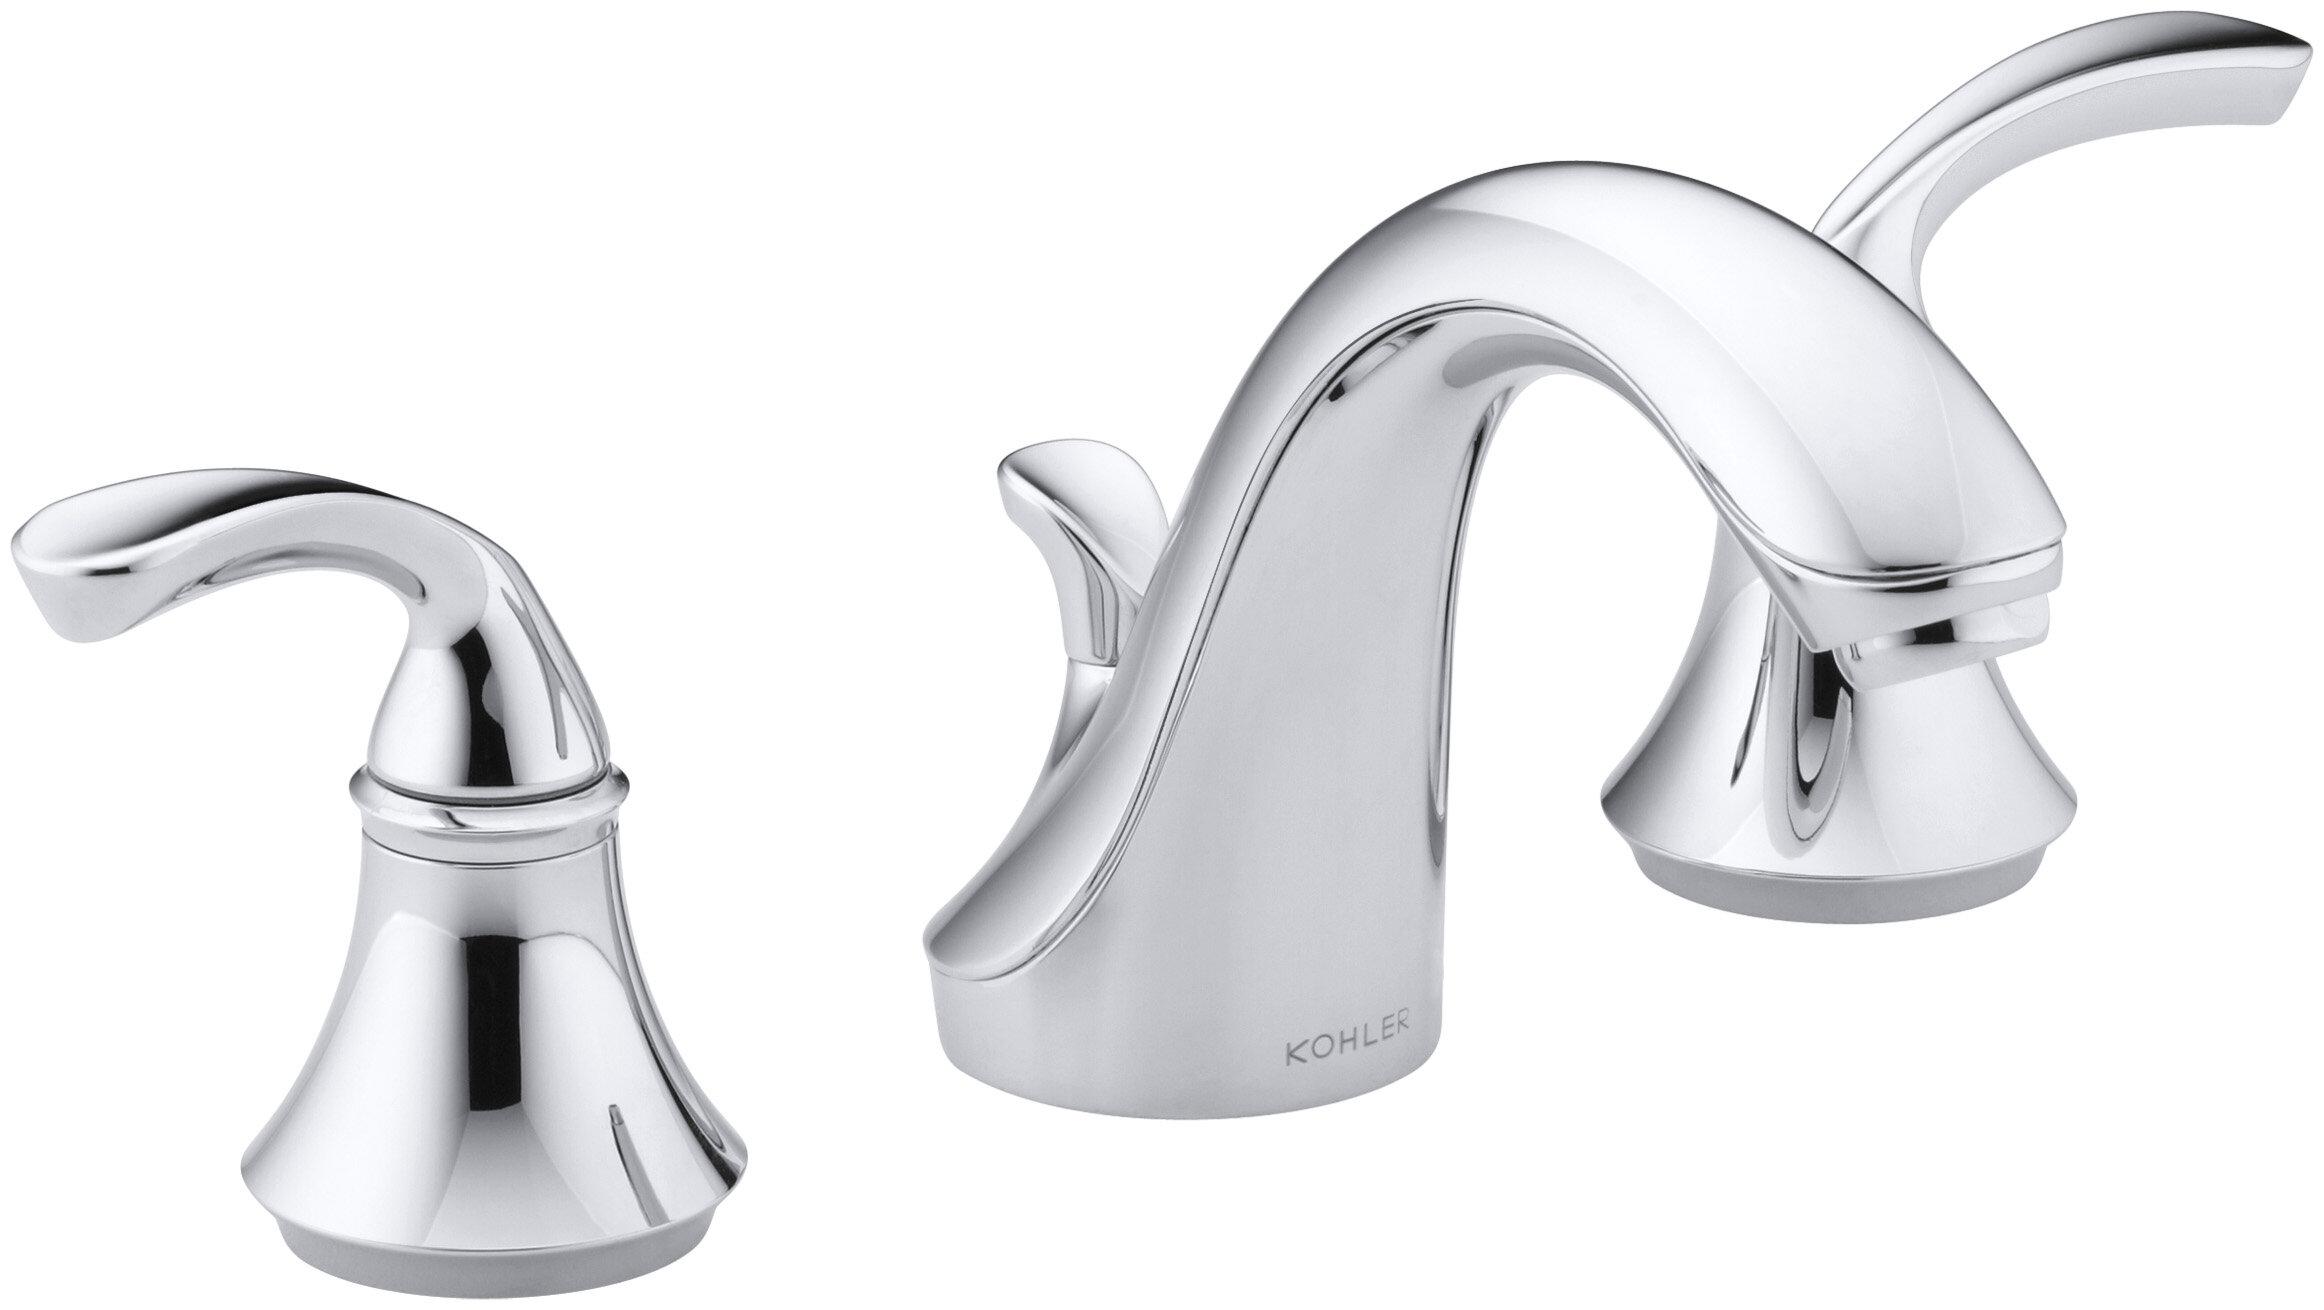 K-10272-4-BN,CP,G Kohler Forté Widespread Bathroom Faucet with Drain ...